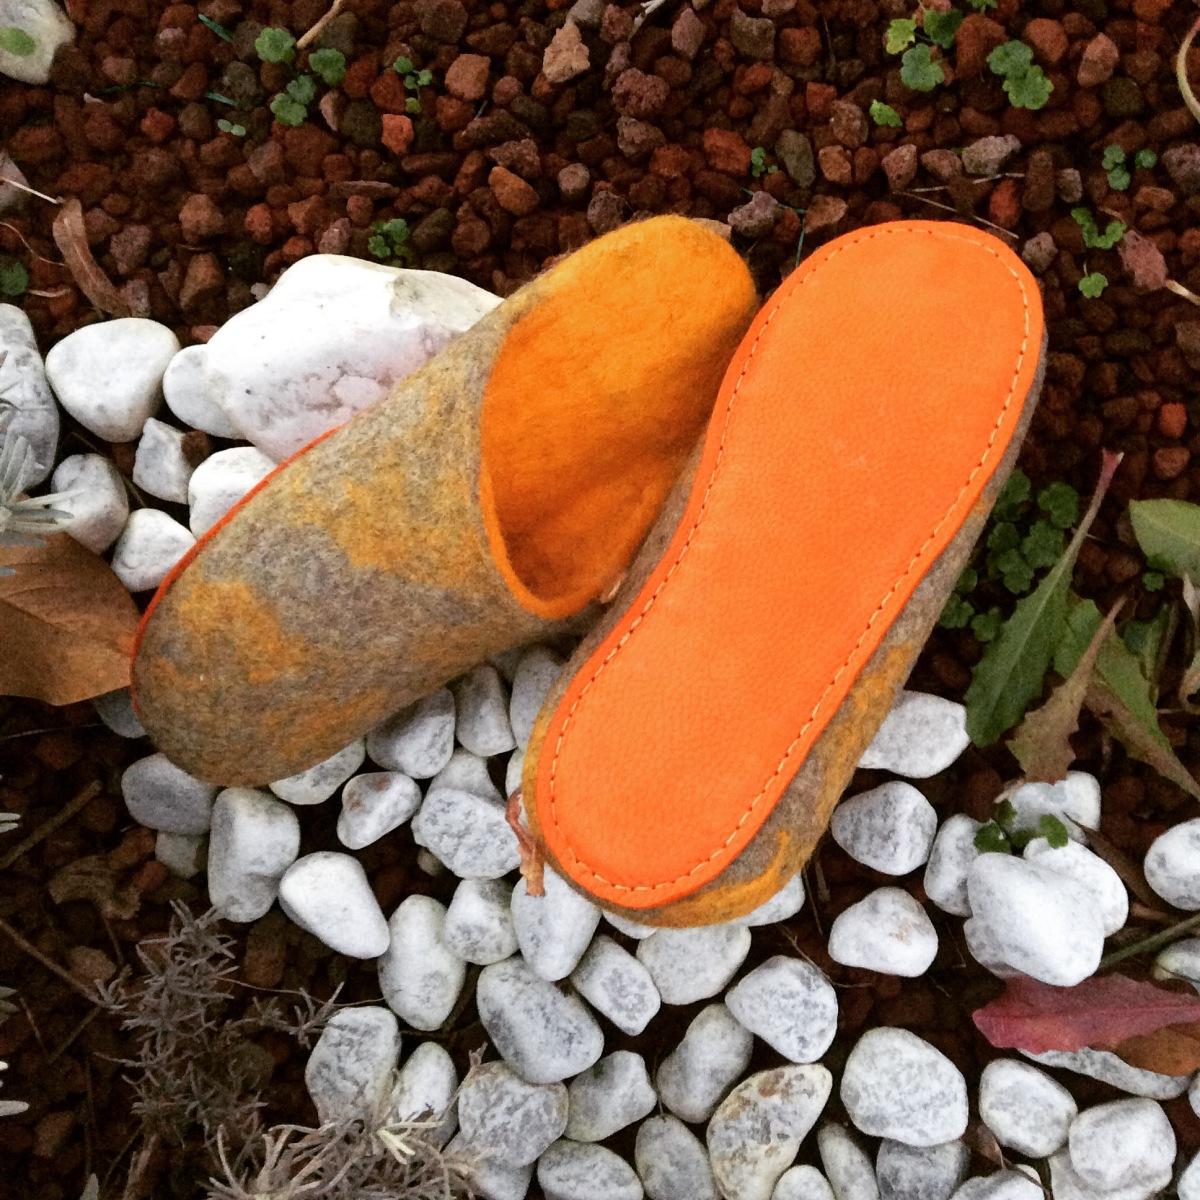 pantofole in feltro e suola in pelle